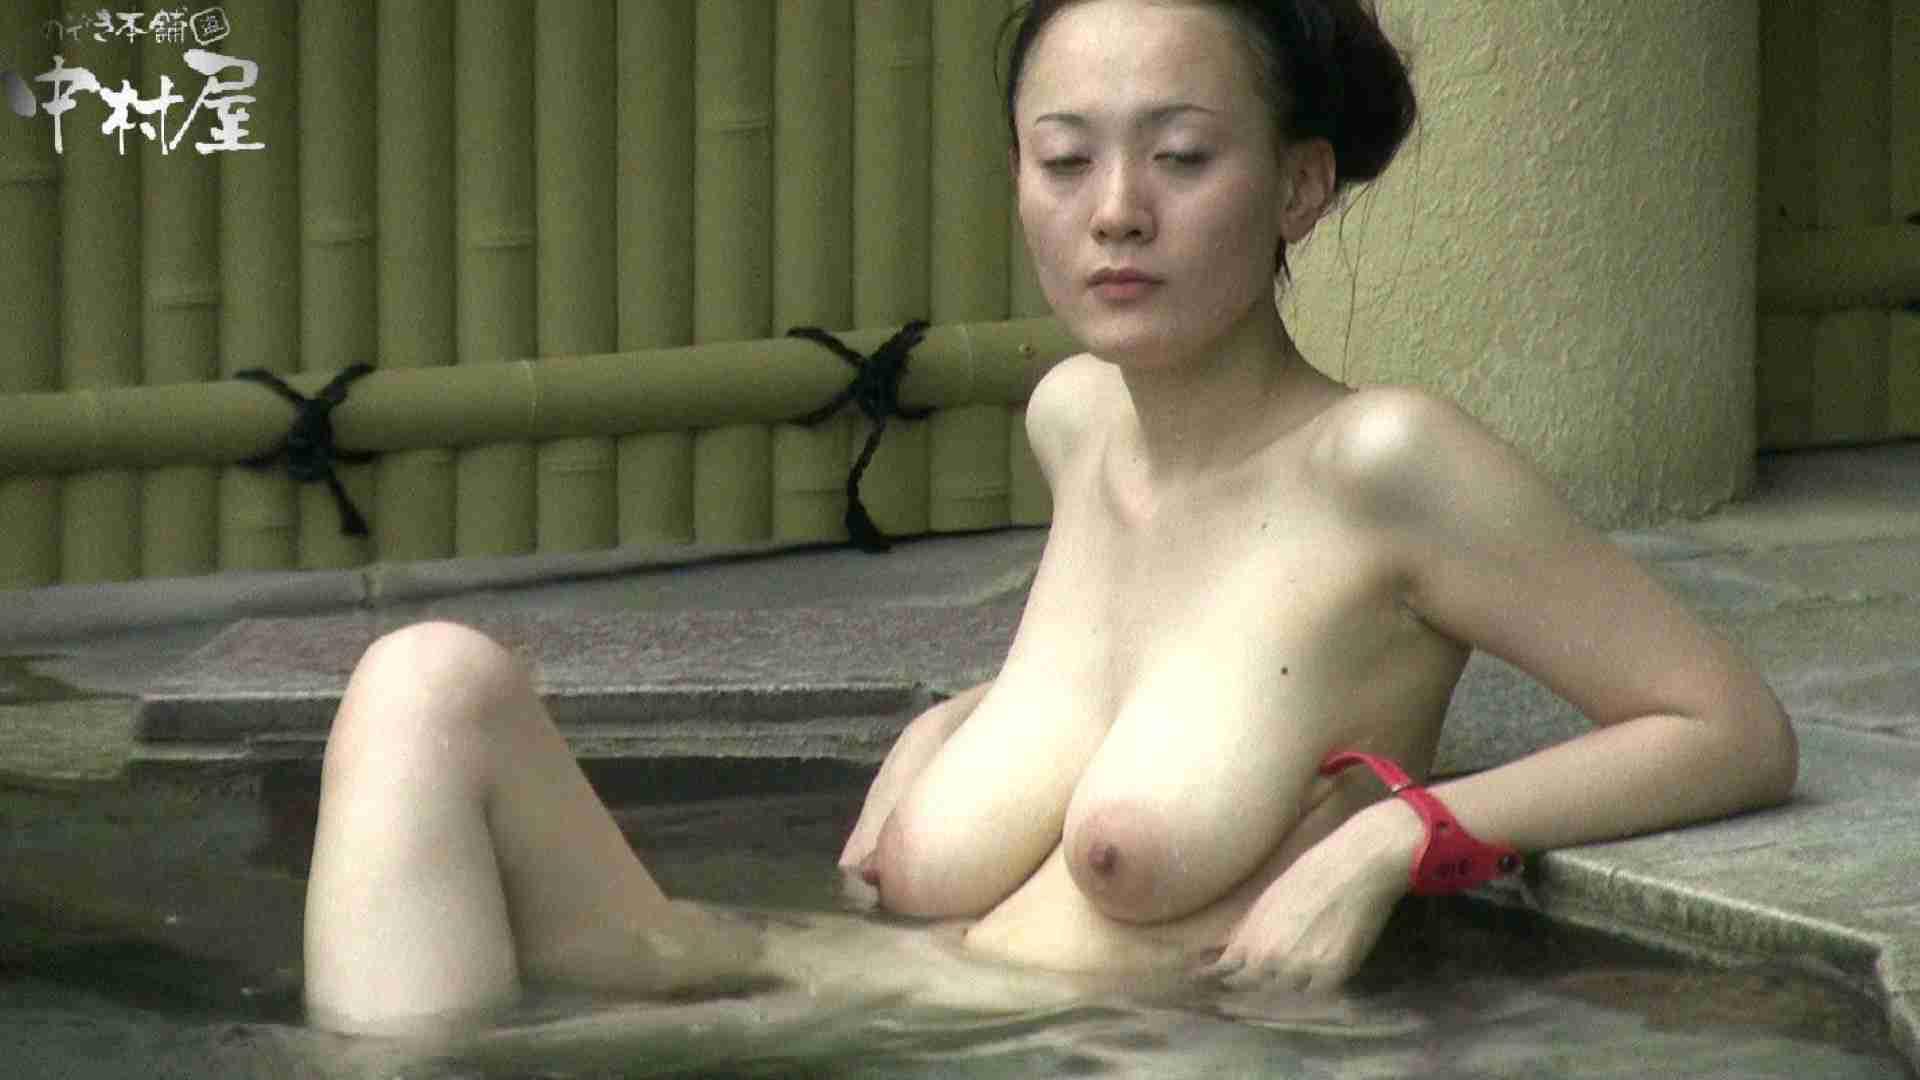 Aquaな露天風呂Vol.903 0  41連発 30